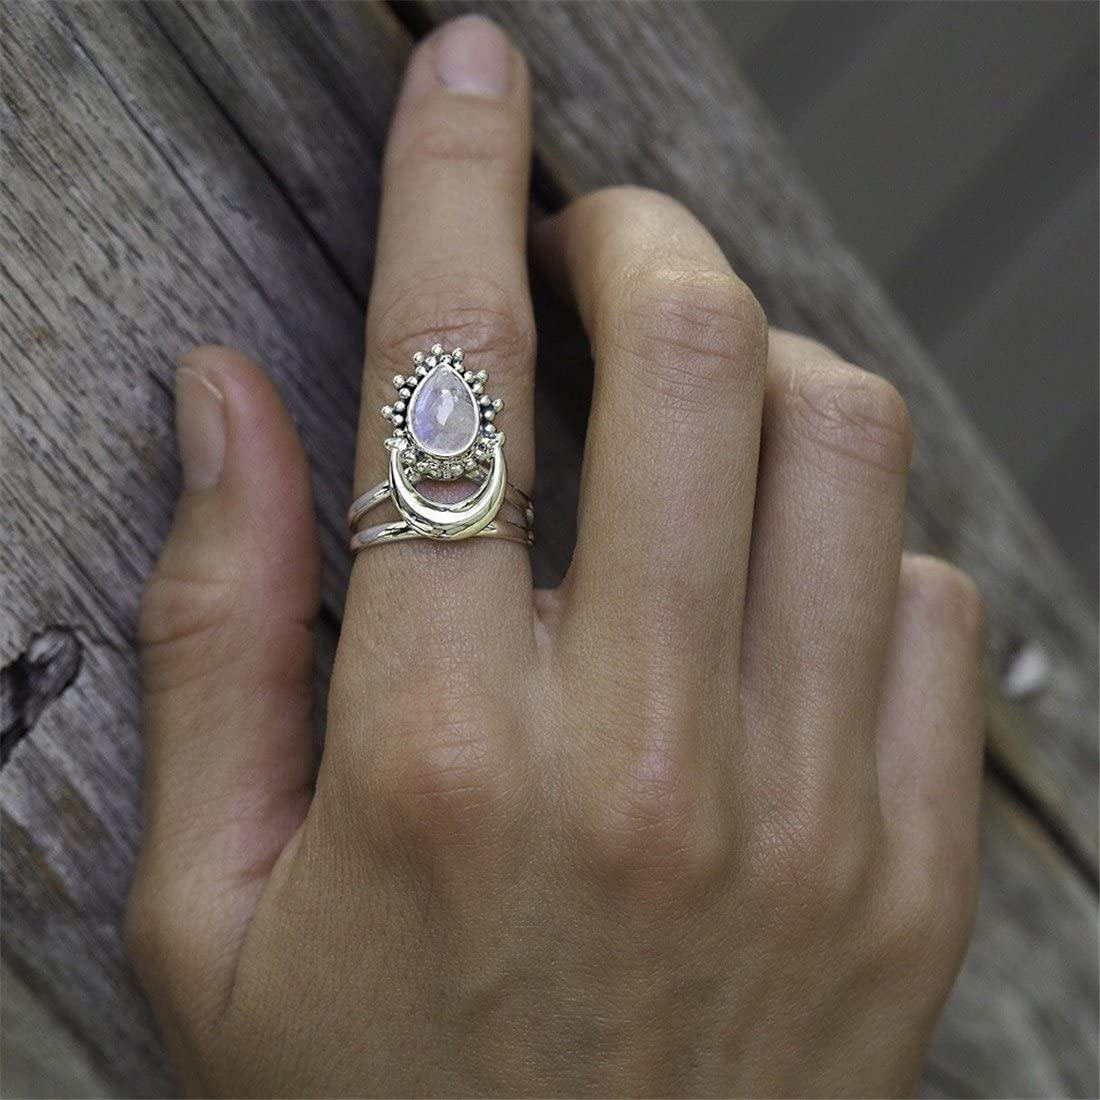 Yesiidor Crescent Anillo de plata con piedra lunar, estilo vintage, estilo bohemio, para regalo, cobre, As Pictures, 10